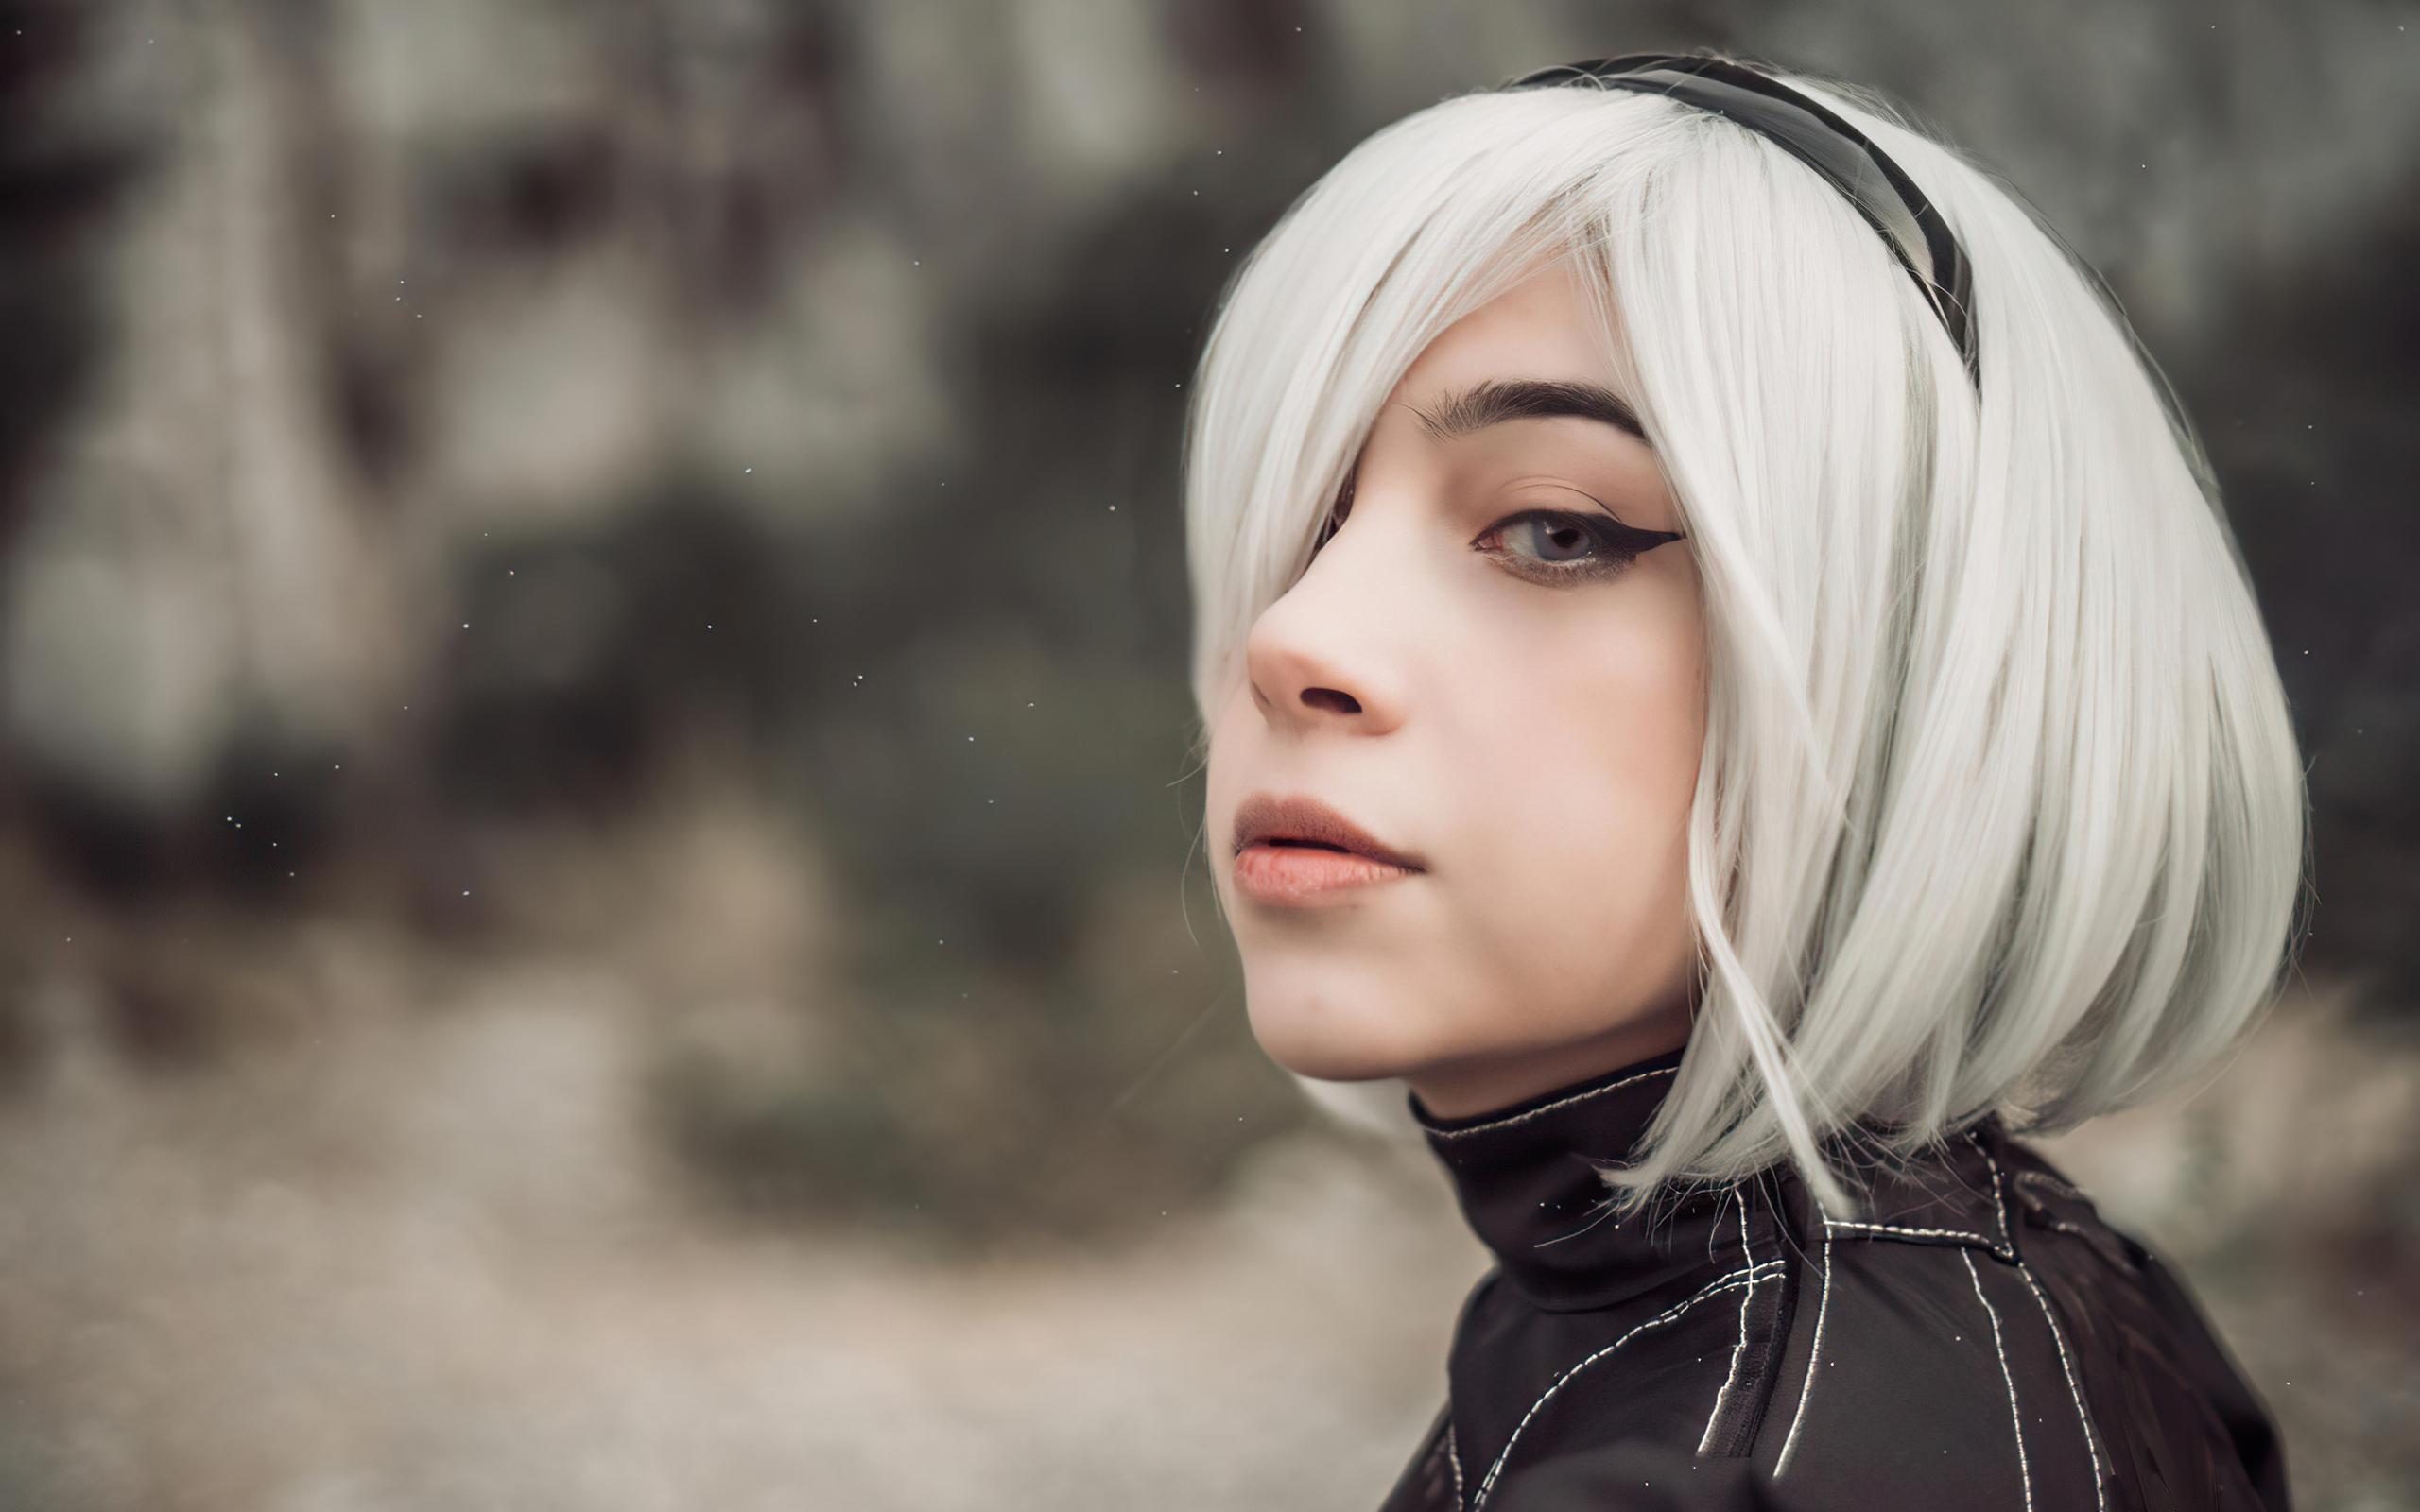 eye-2b-nier-automata-cosplay-4k-mx.jpg